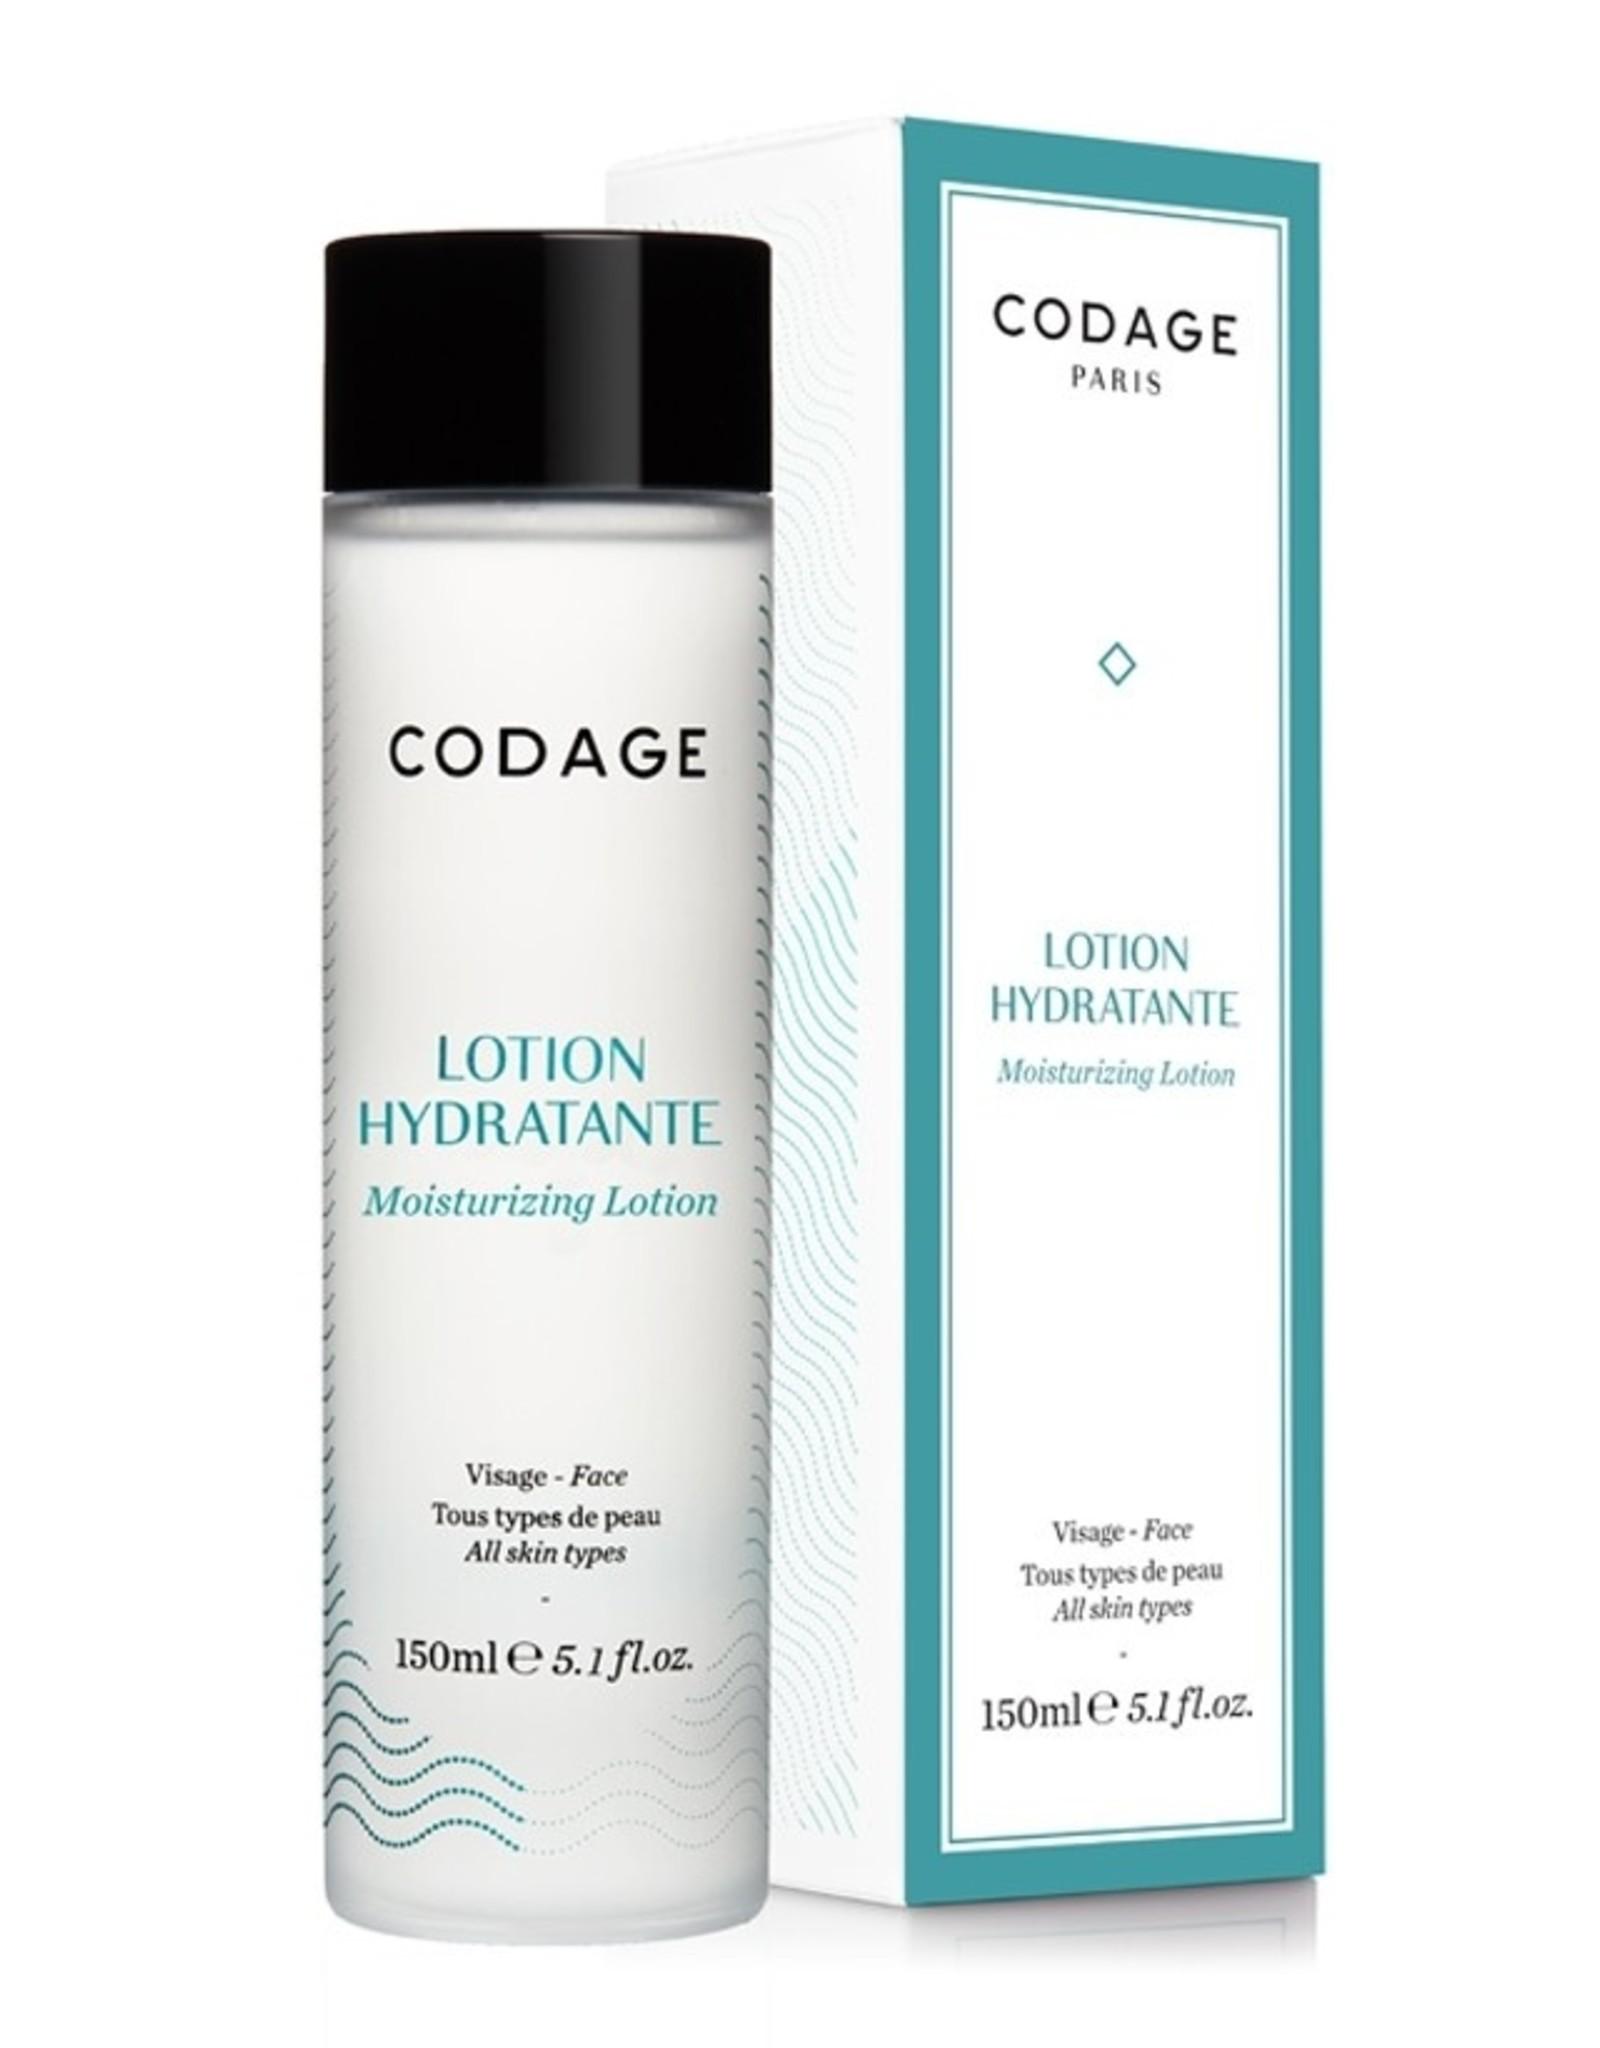 Codage Paris CODAGE PARIS  Moisturizing Lotion  150ML